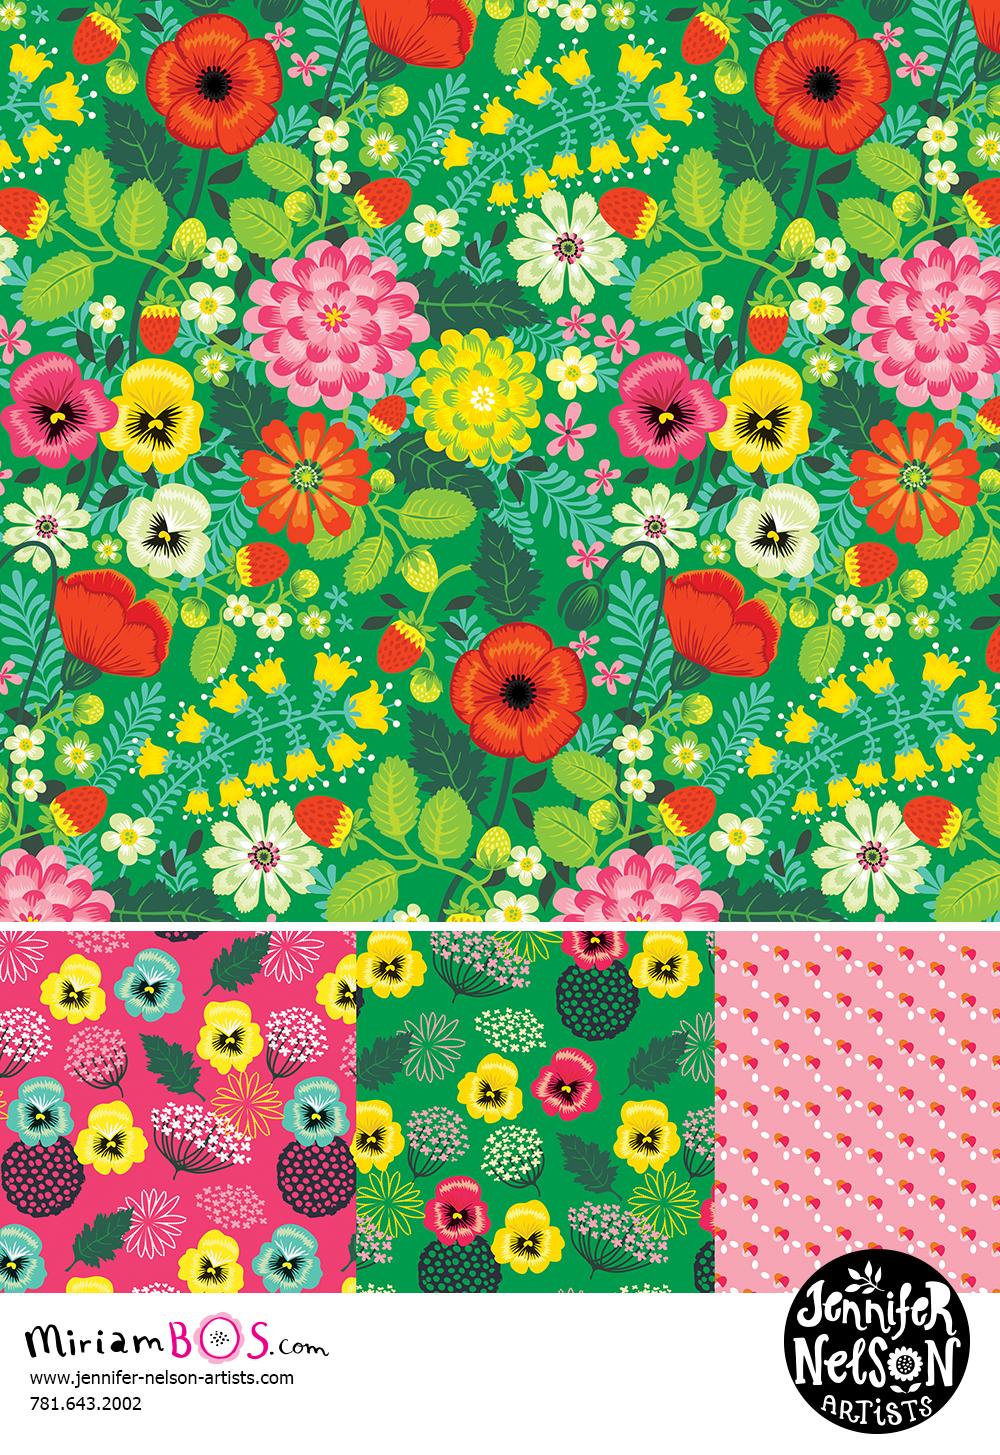 MiriamBos_web-repeat-FLO-fieldflowers